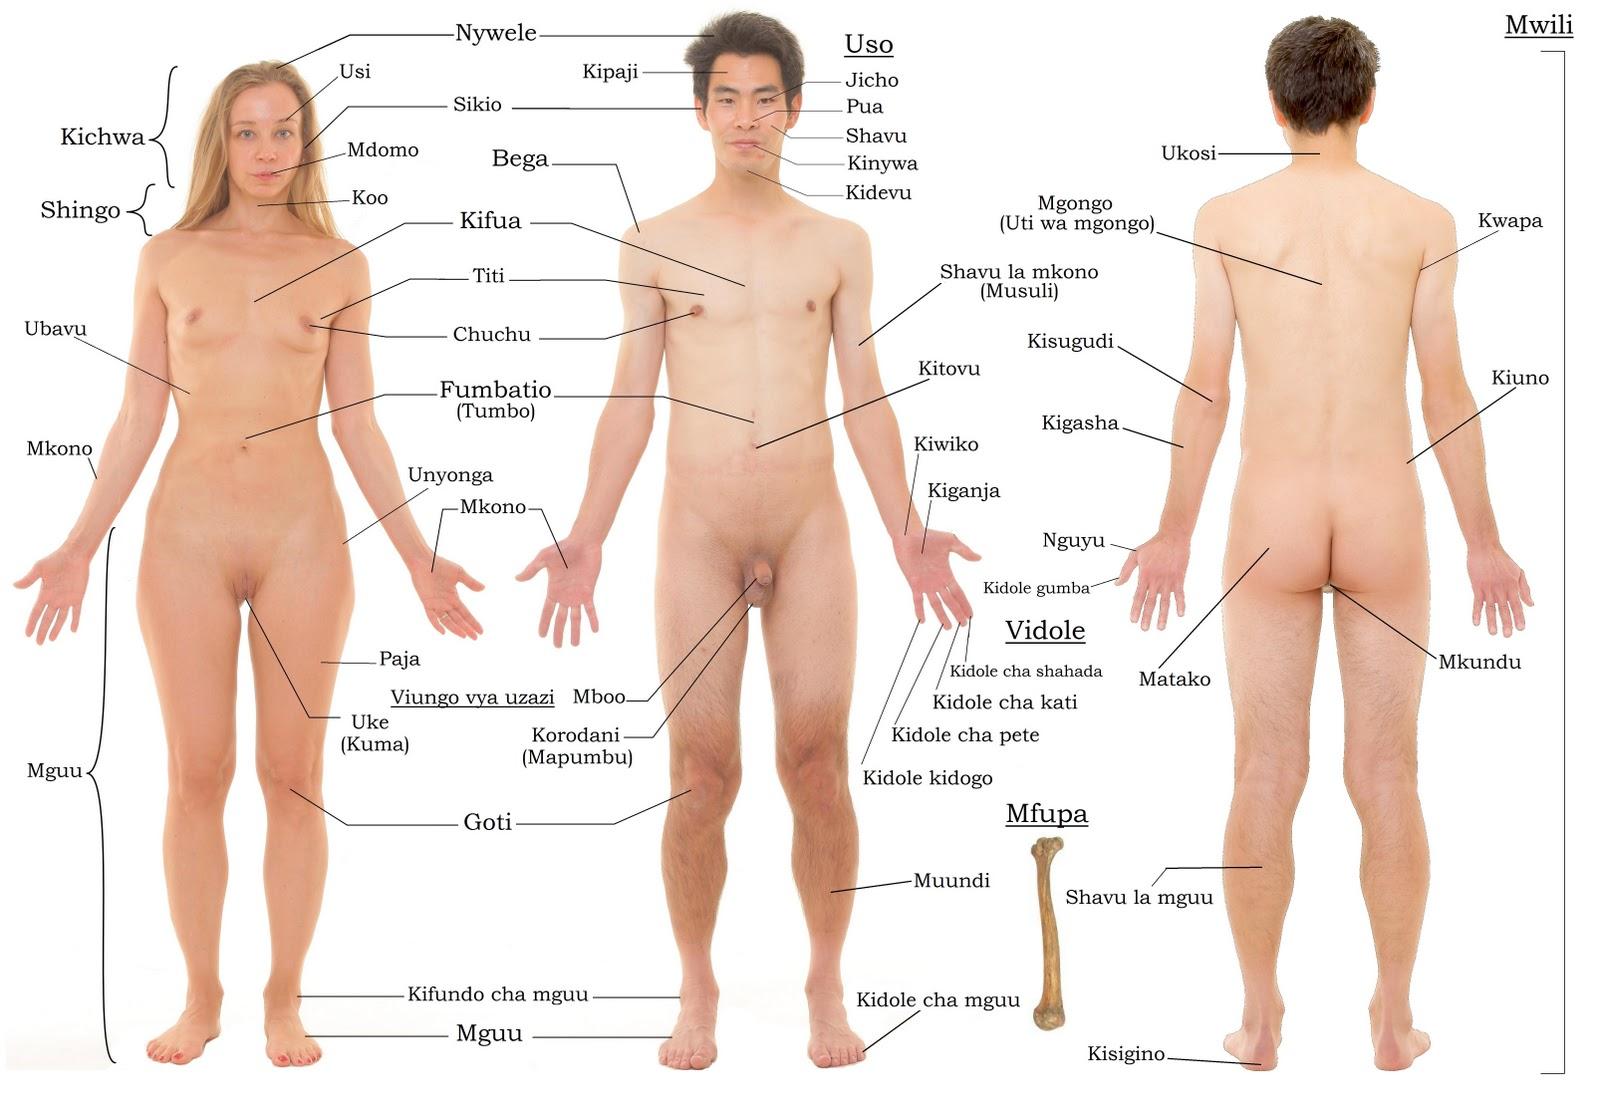 20 Fakta Unik Seputar Tubuh Manusia Yang Jarang Diketahui